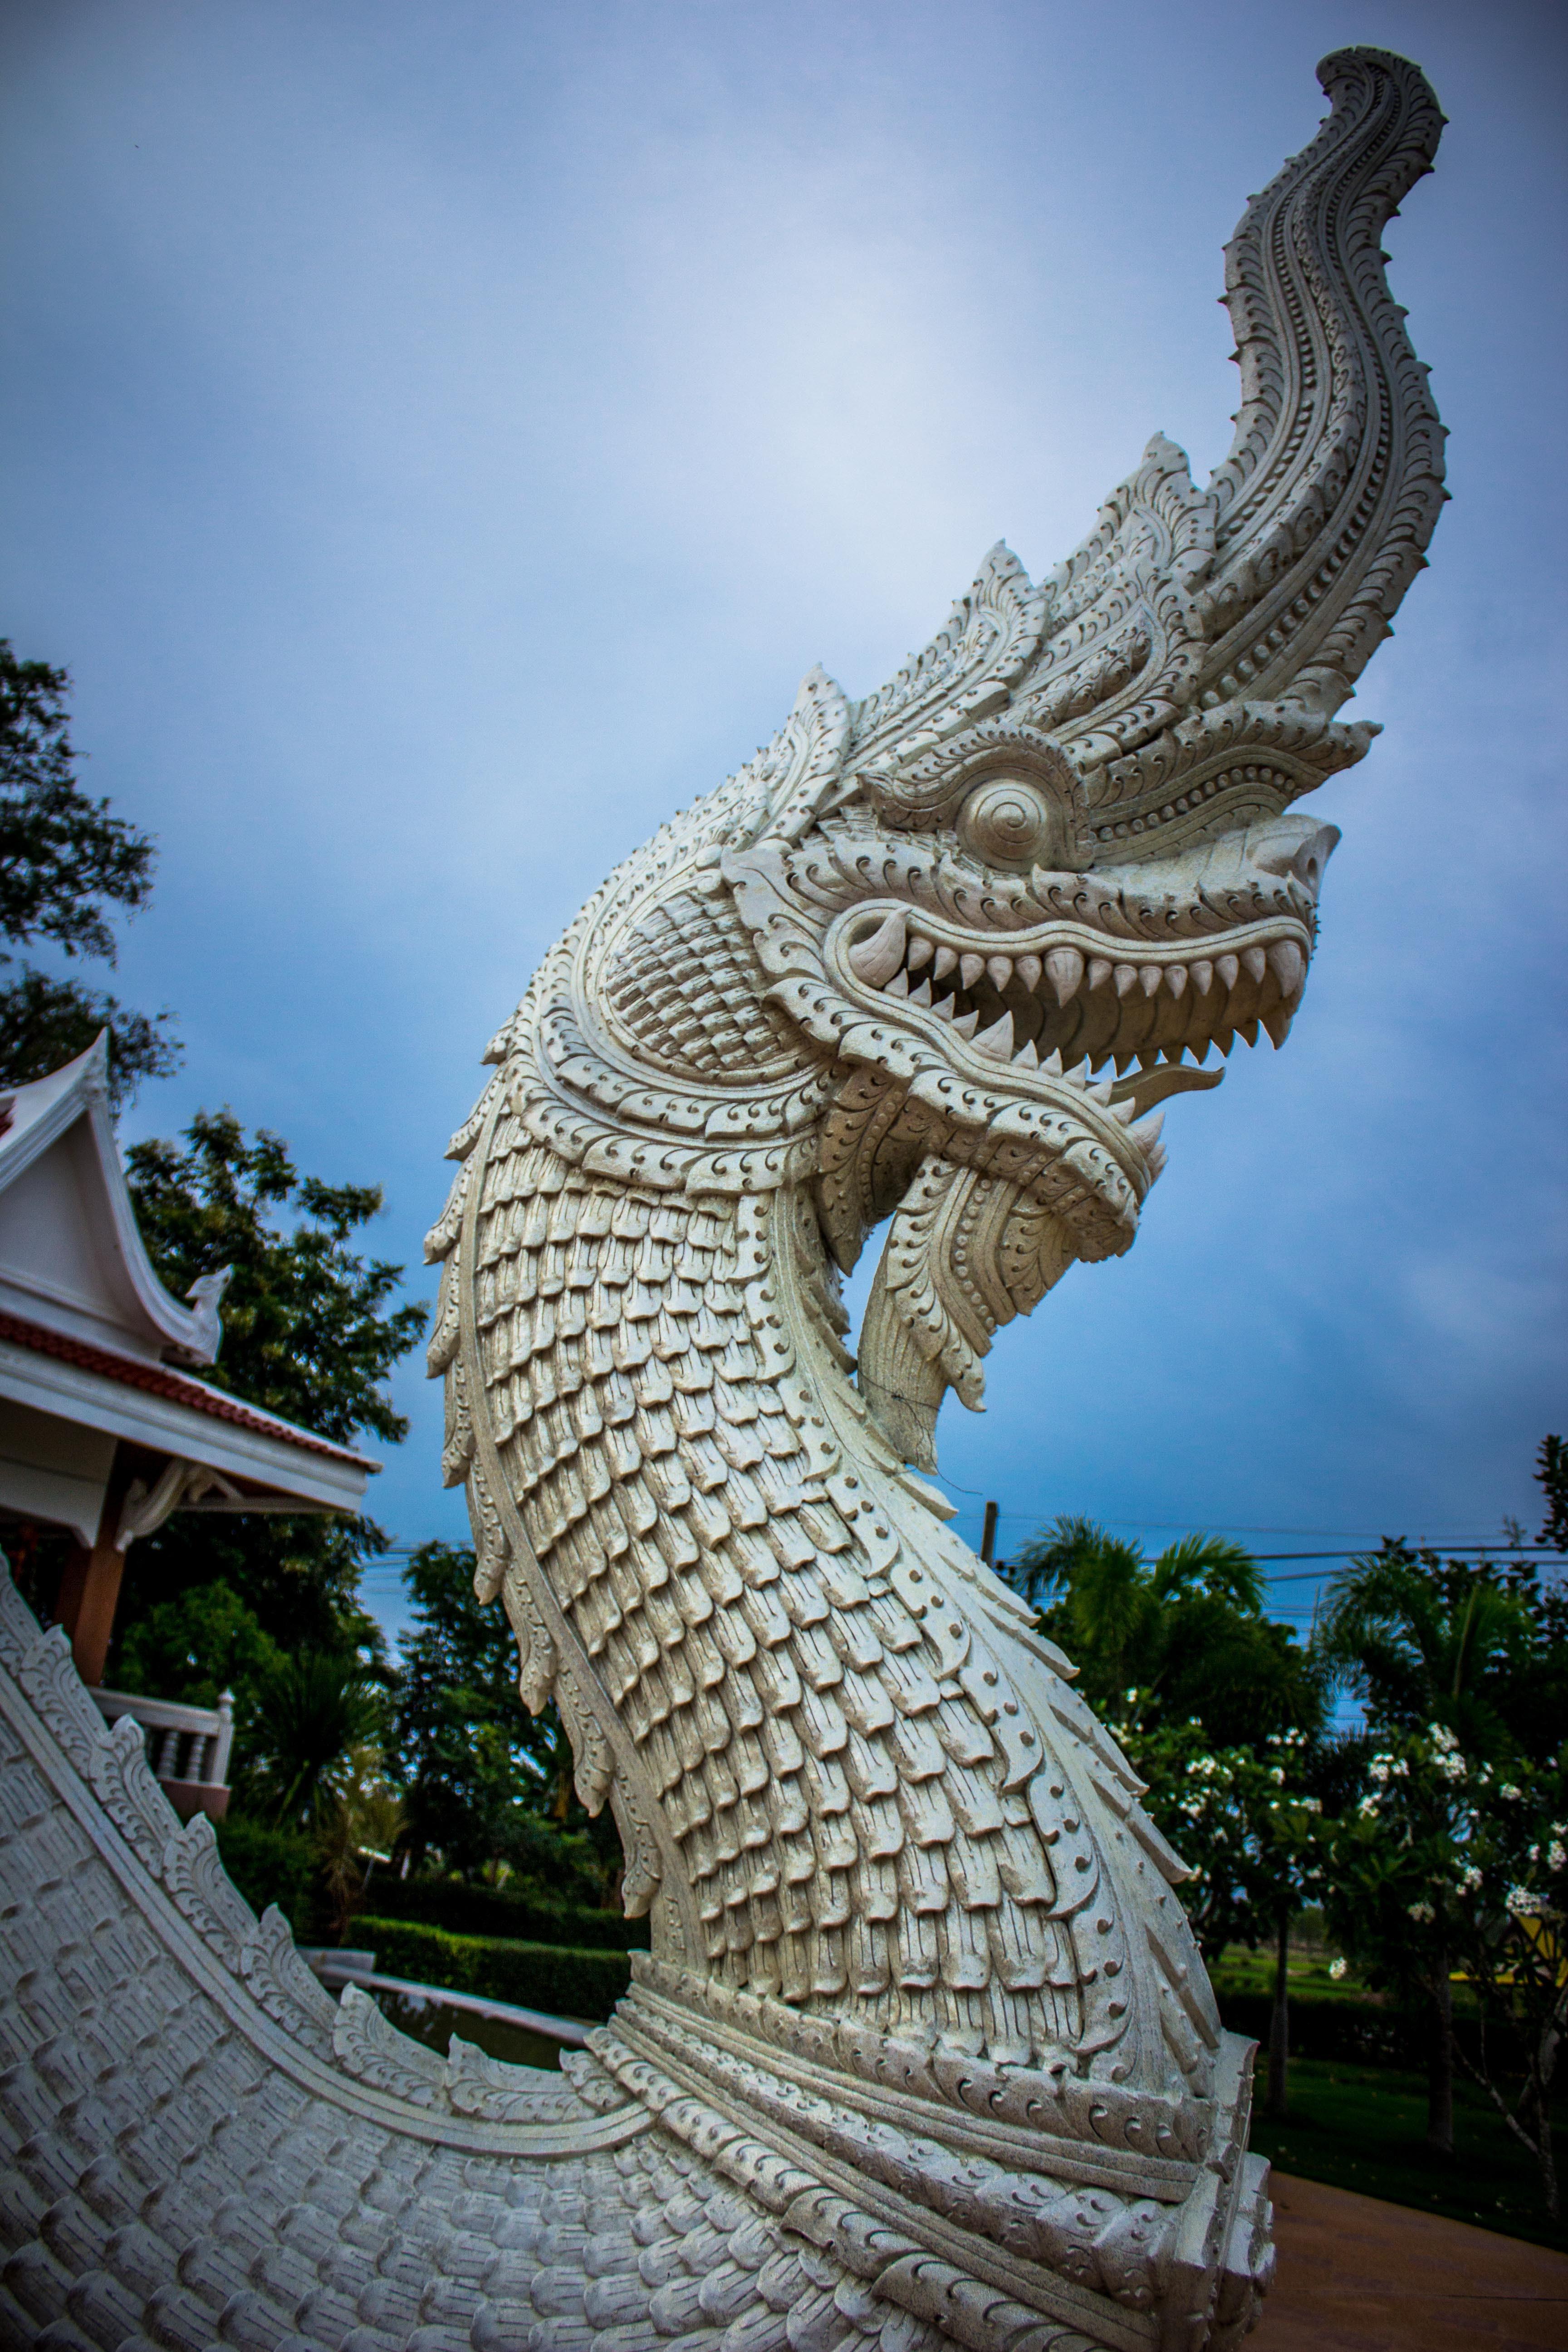 White Dragon Statue, Art, Outdoors, White, Trees, HQ Photo